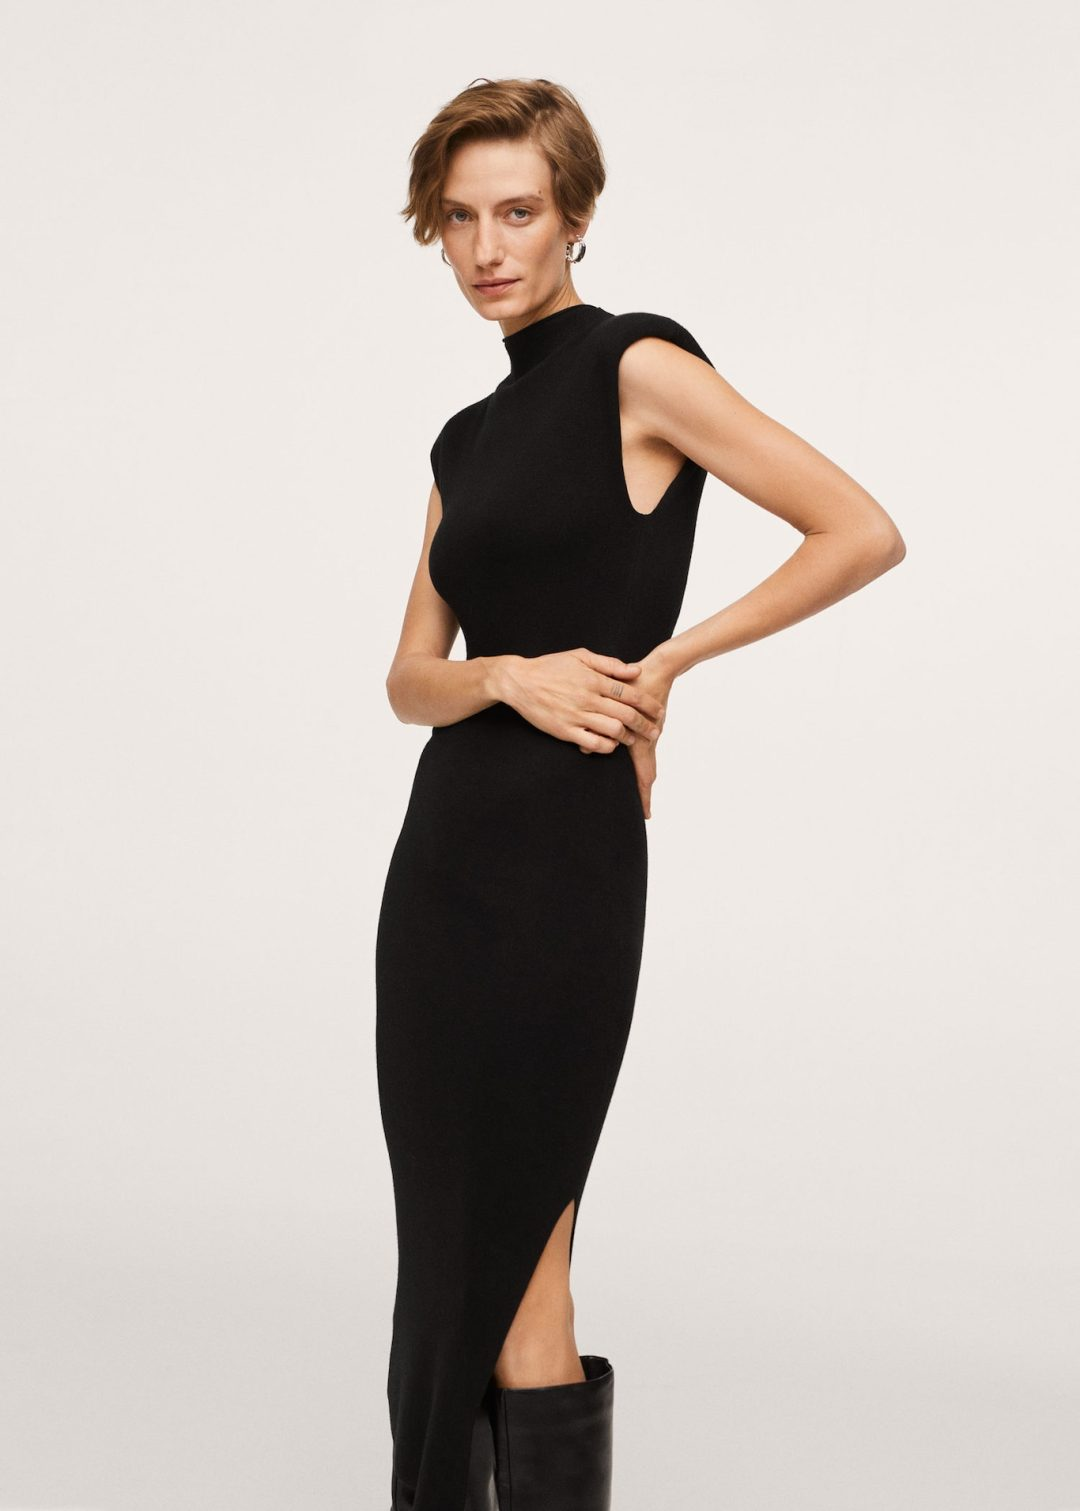 Cute minimalist and aesthetic black dress